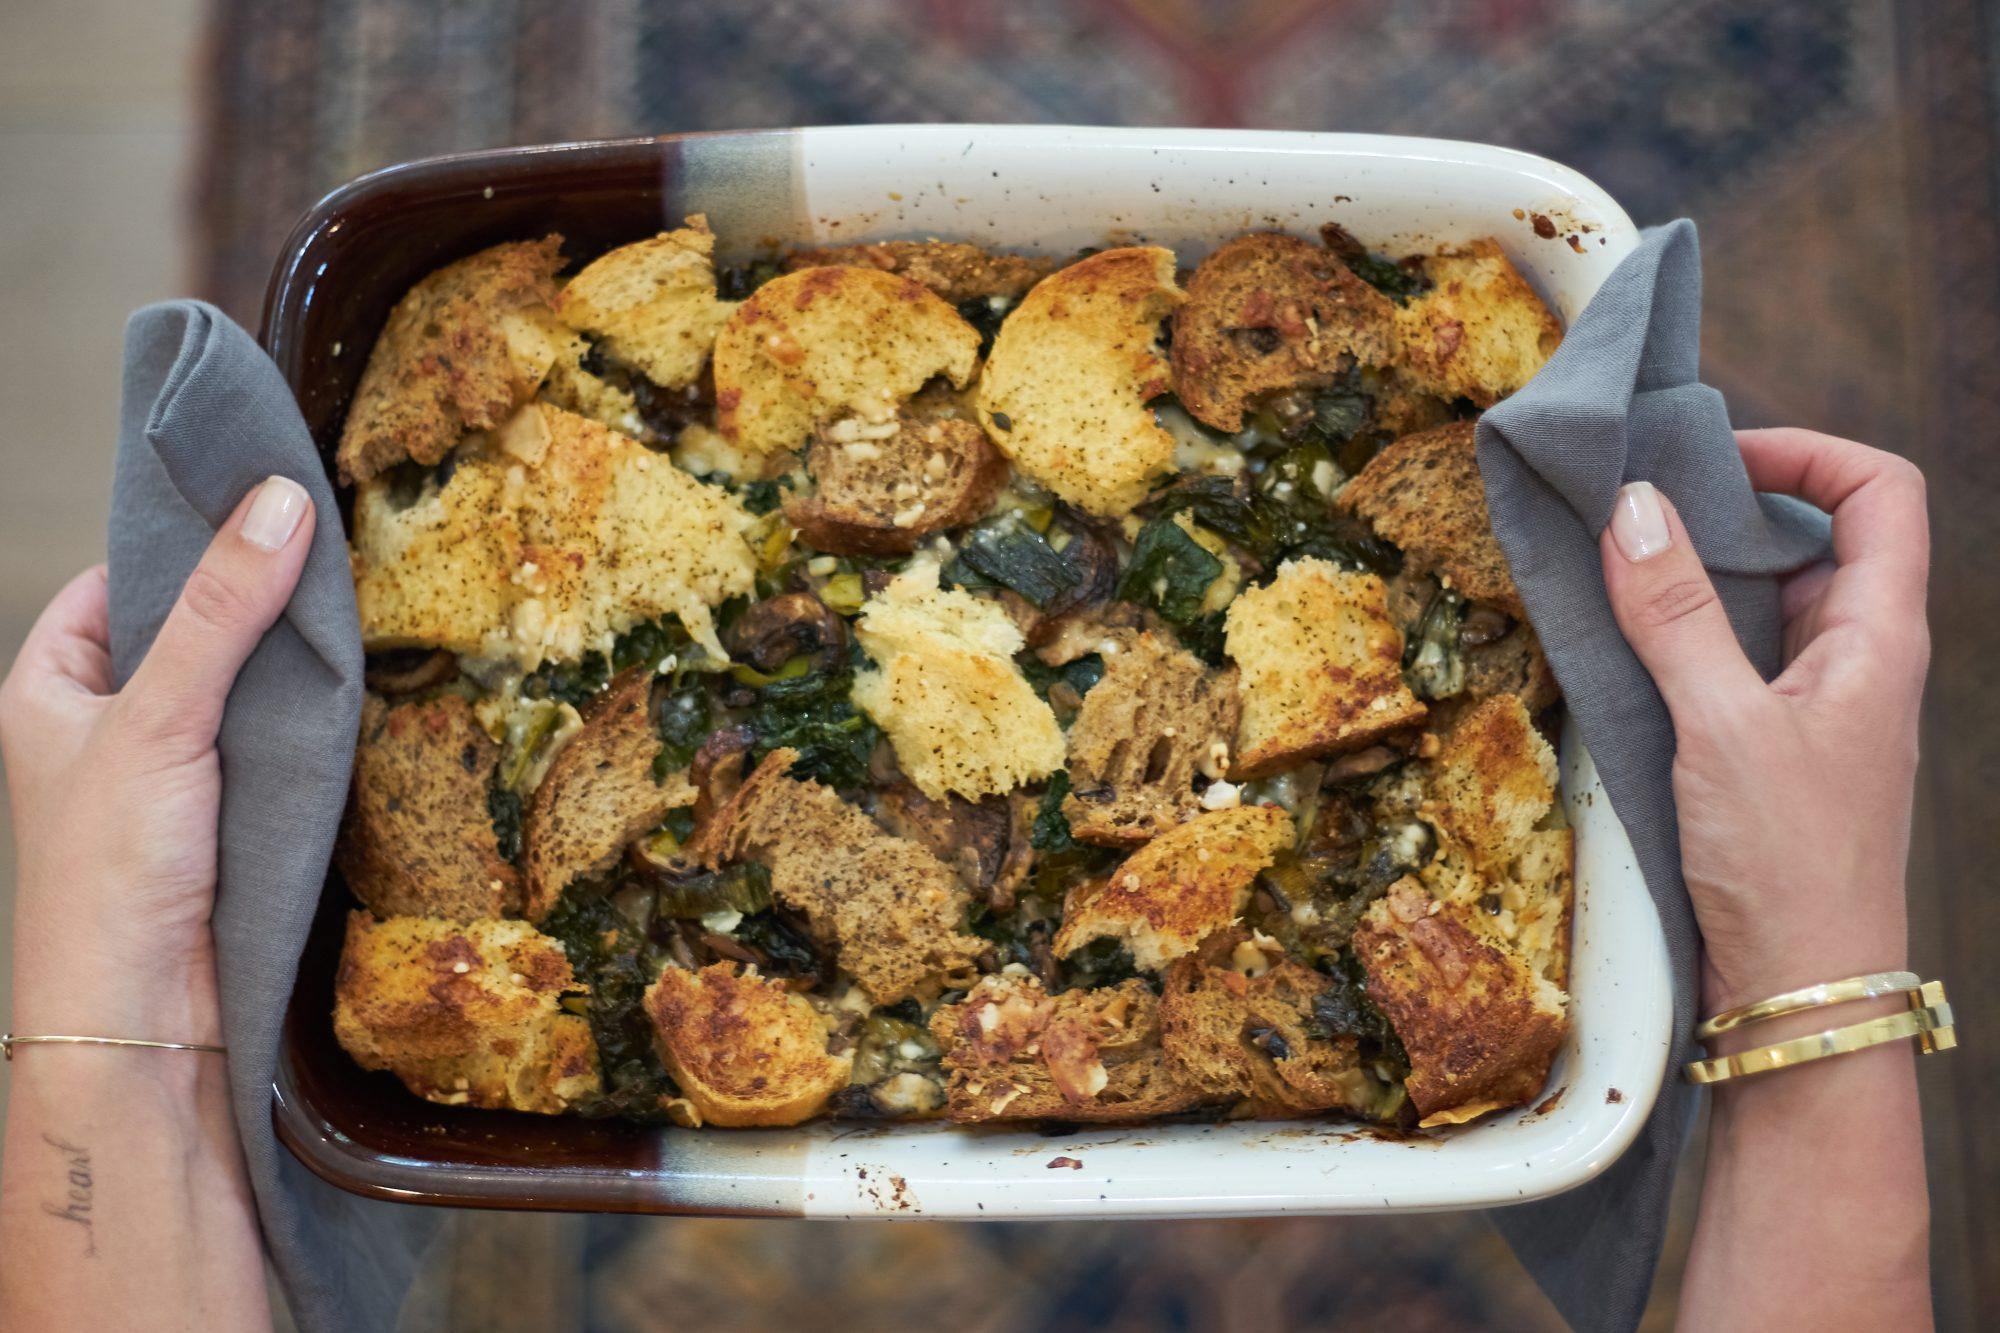 haylie-duff-savory-bread-pudding-image